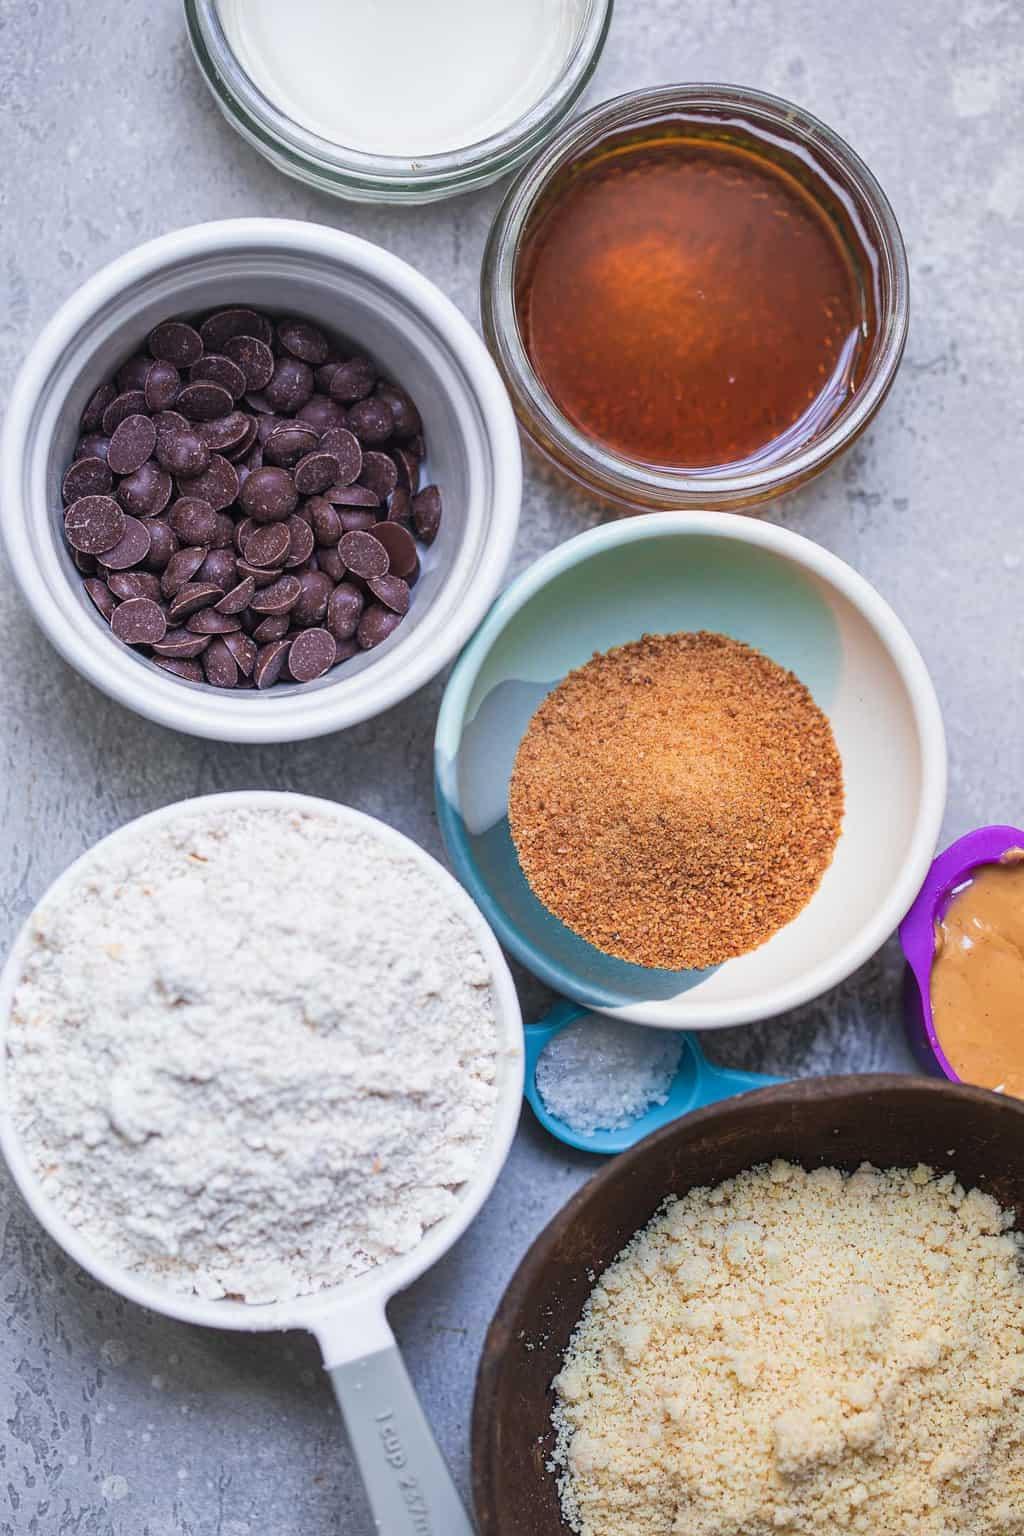 Ingredients for vegan cookie dough